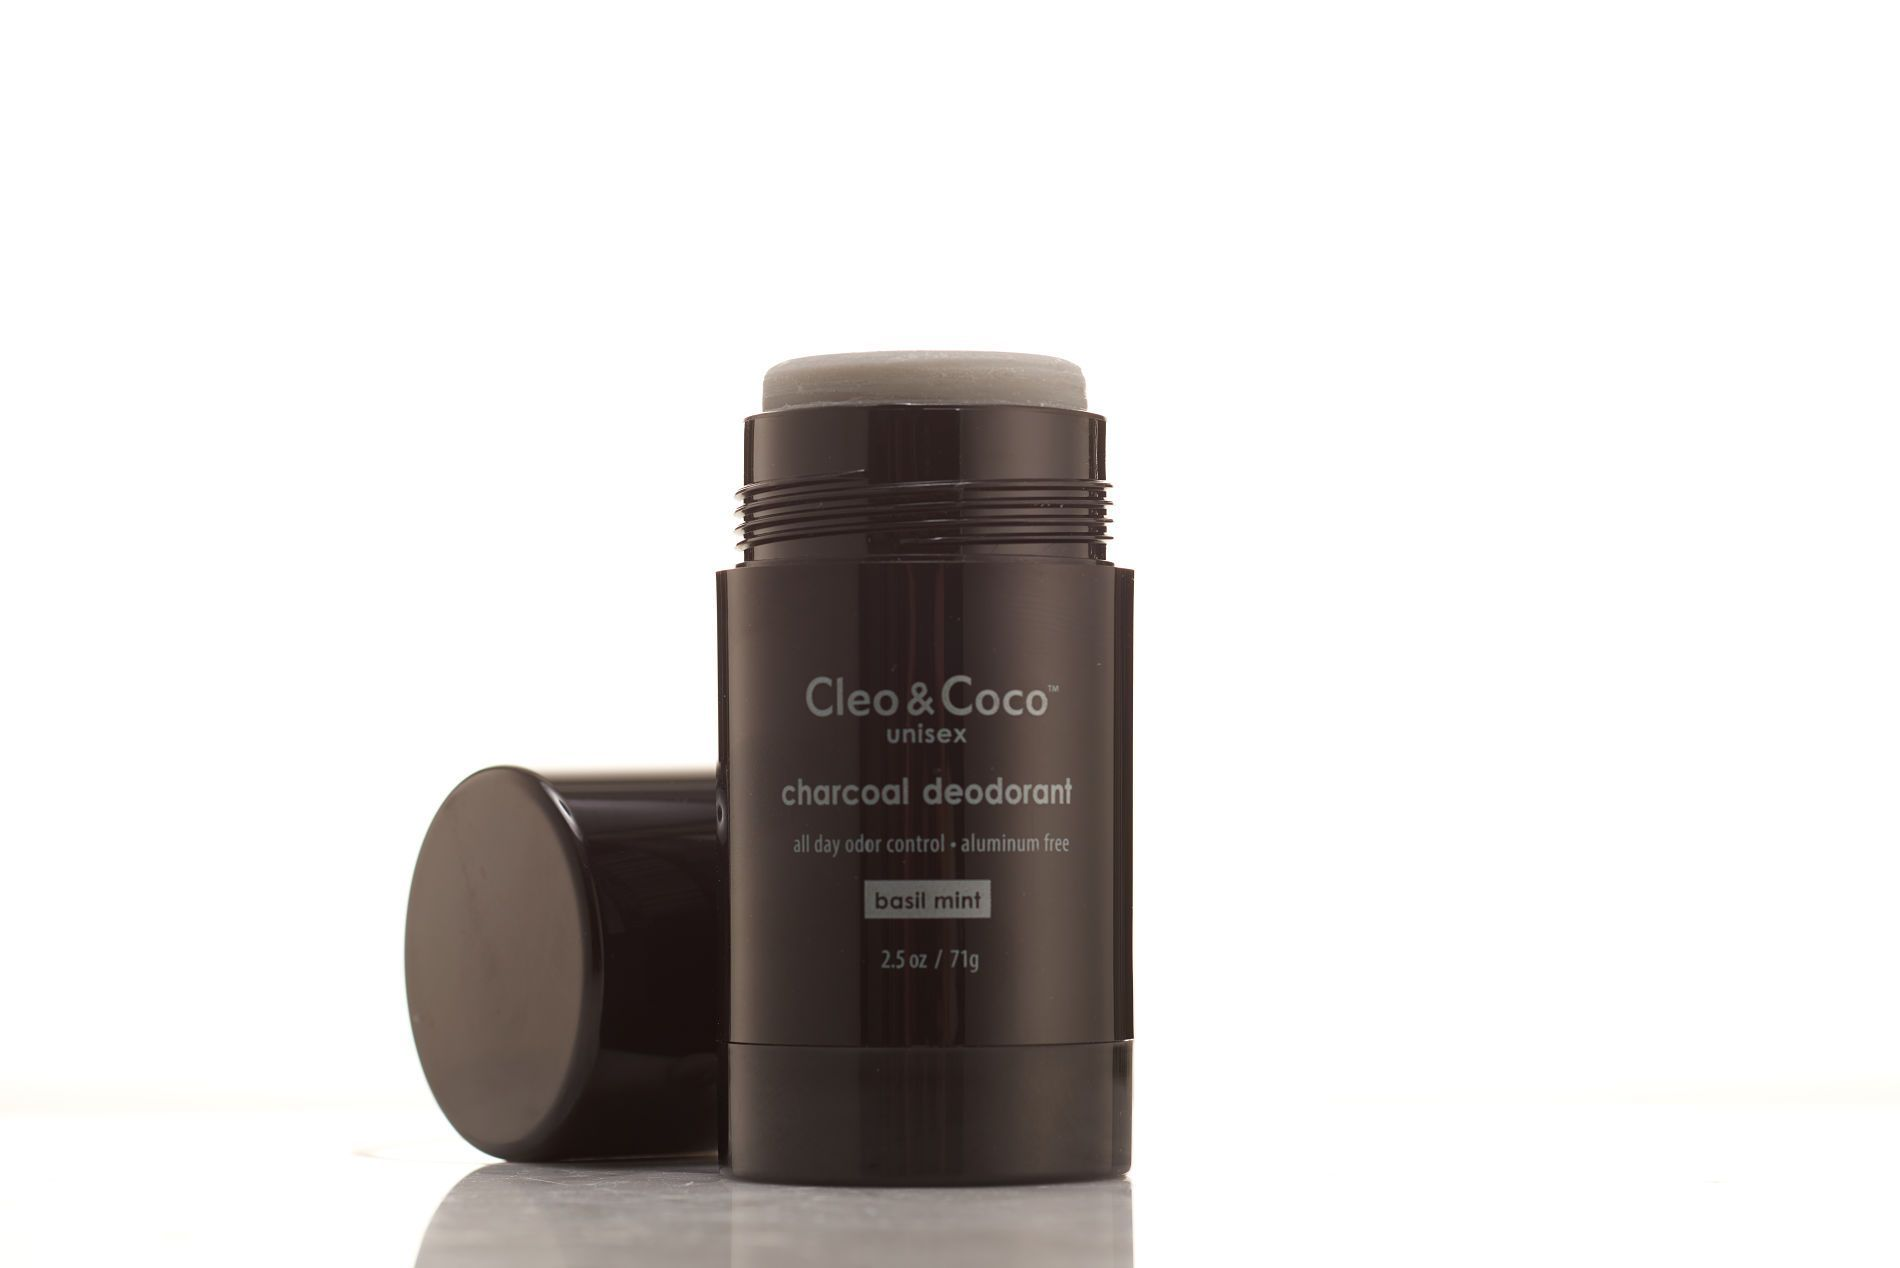 Charcoal deodorant unisex basil mint scent cleococo